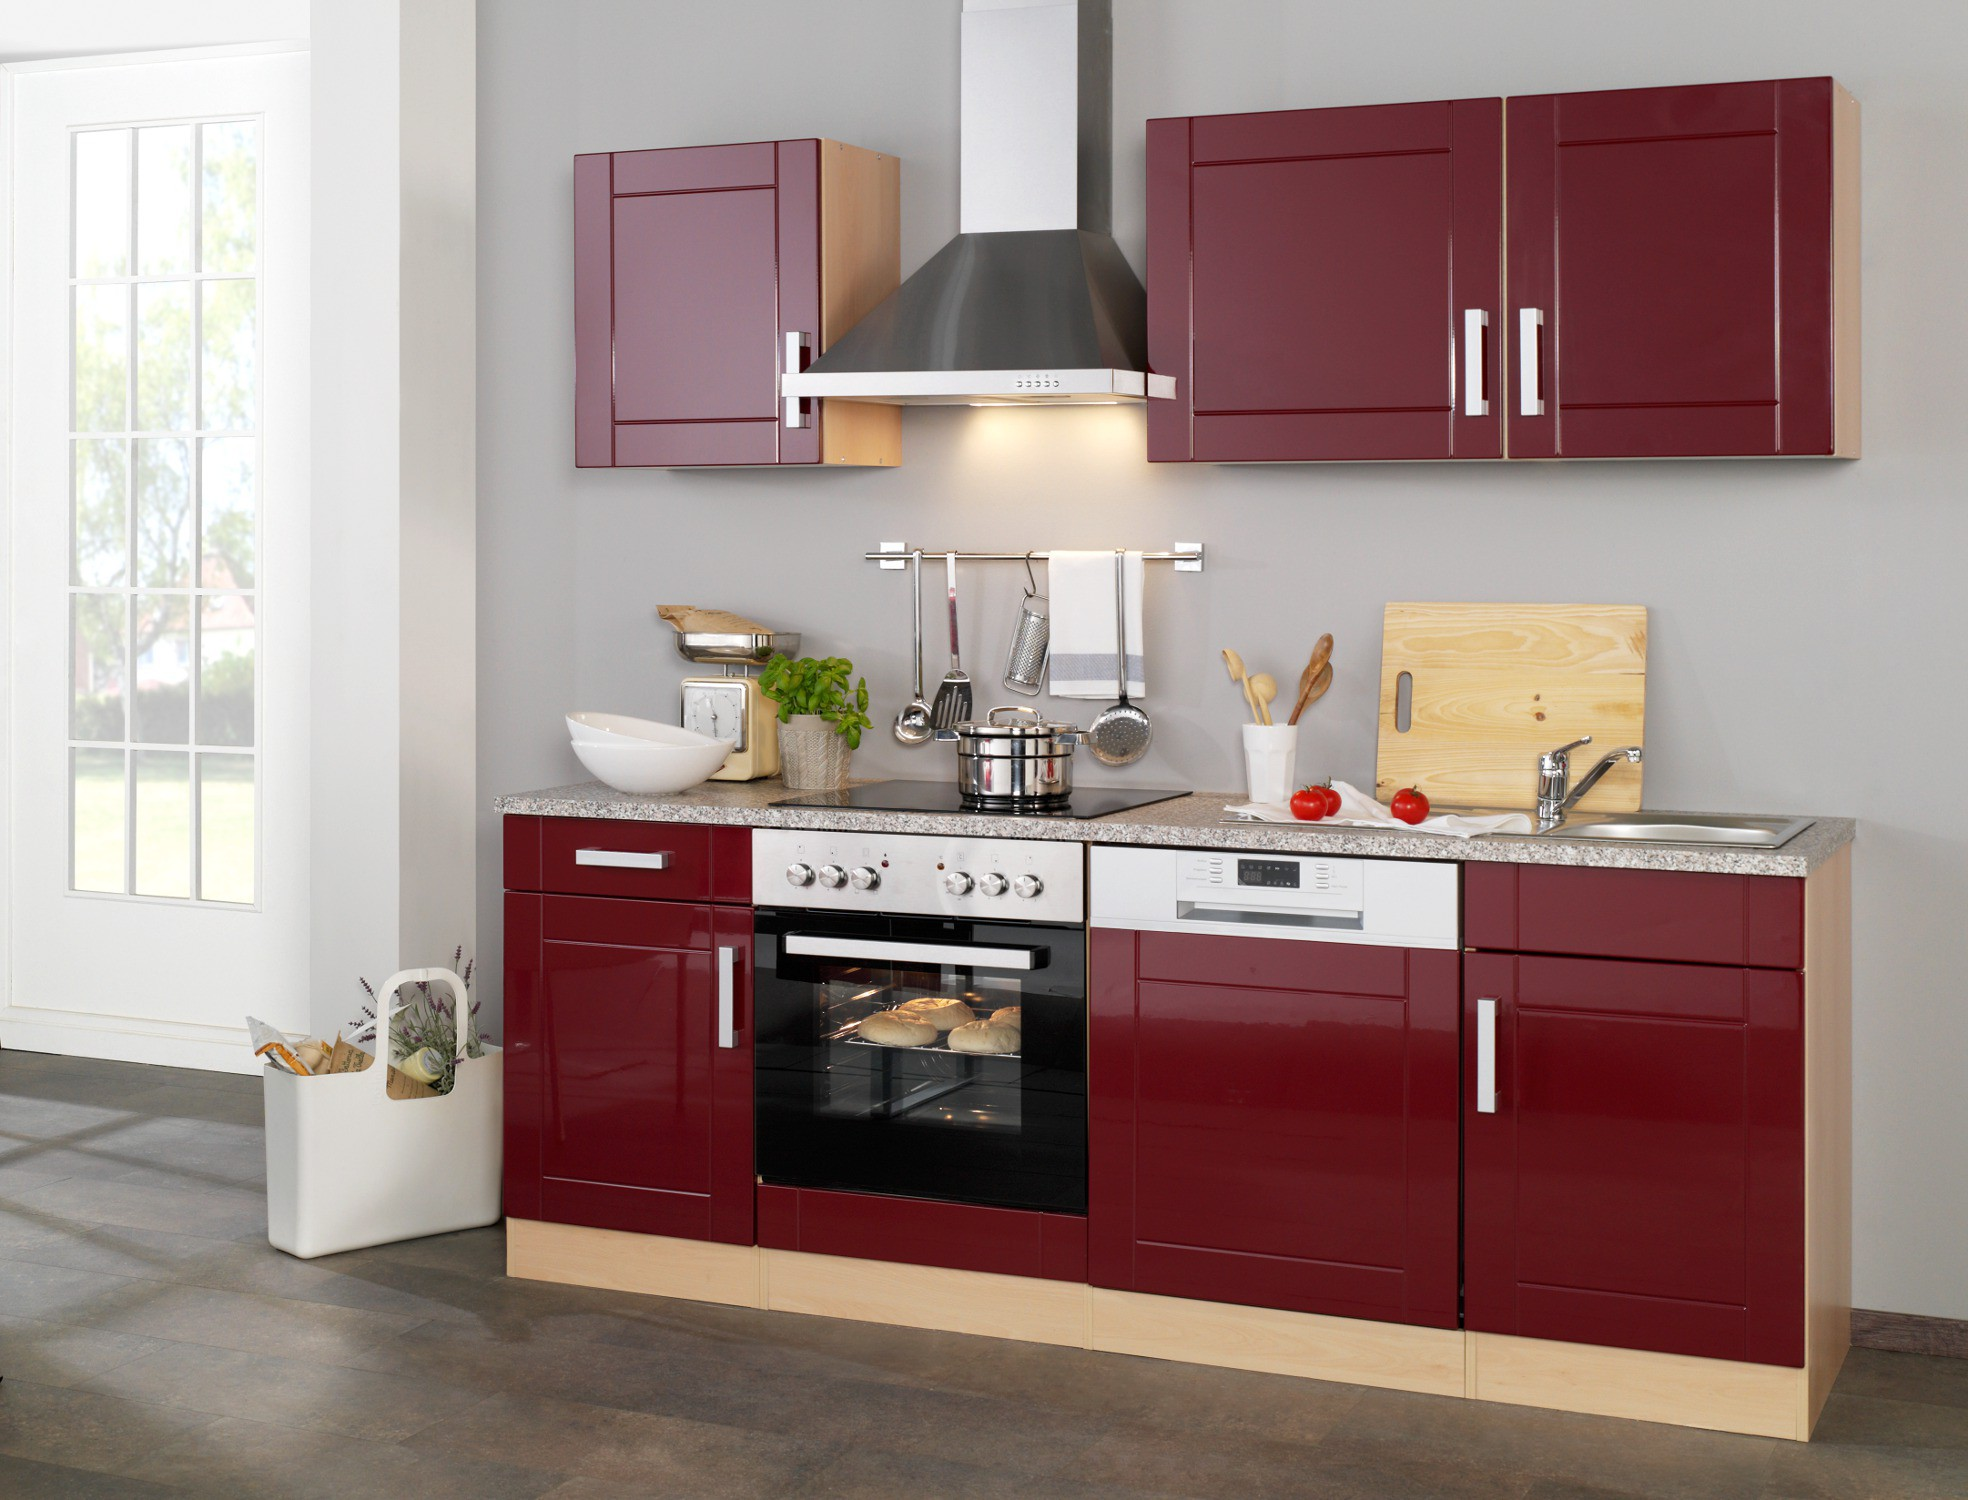 Full Size of Küche Ohne Elektrogeräte Kaufen Sinnvoll Ikea Küche Ohne Elektrogeräte Küche Ohne Elektrogeräte Günstig Kaufen Roller Küche Ohne Elektrogeräte Küche Küche Ohne Elektrogeräte